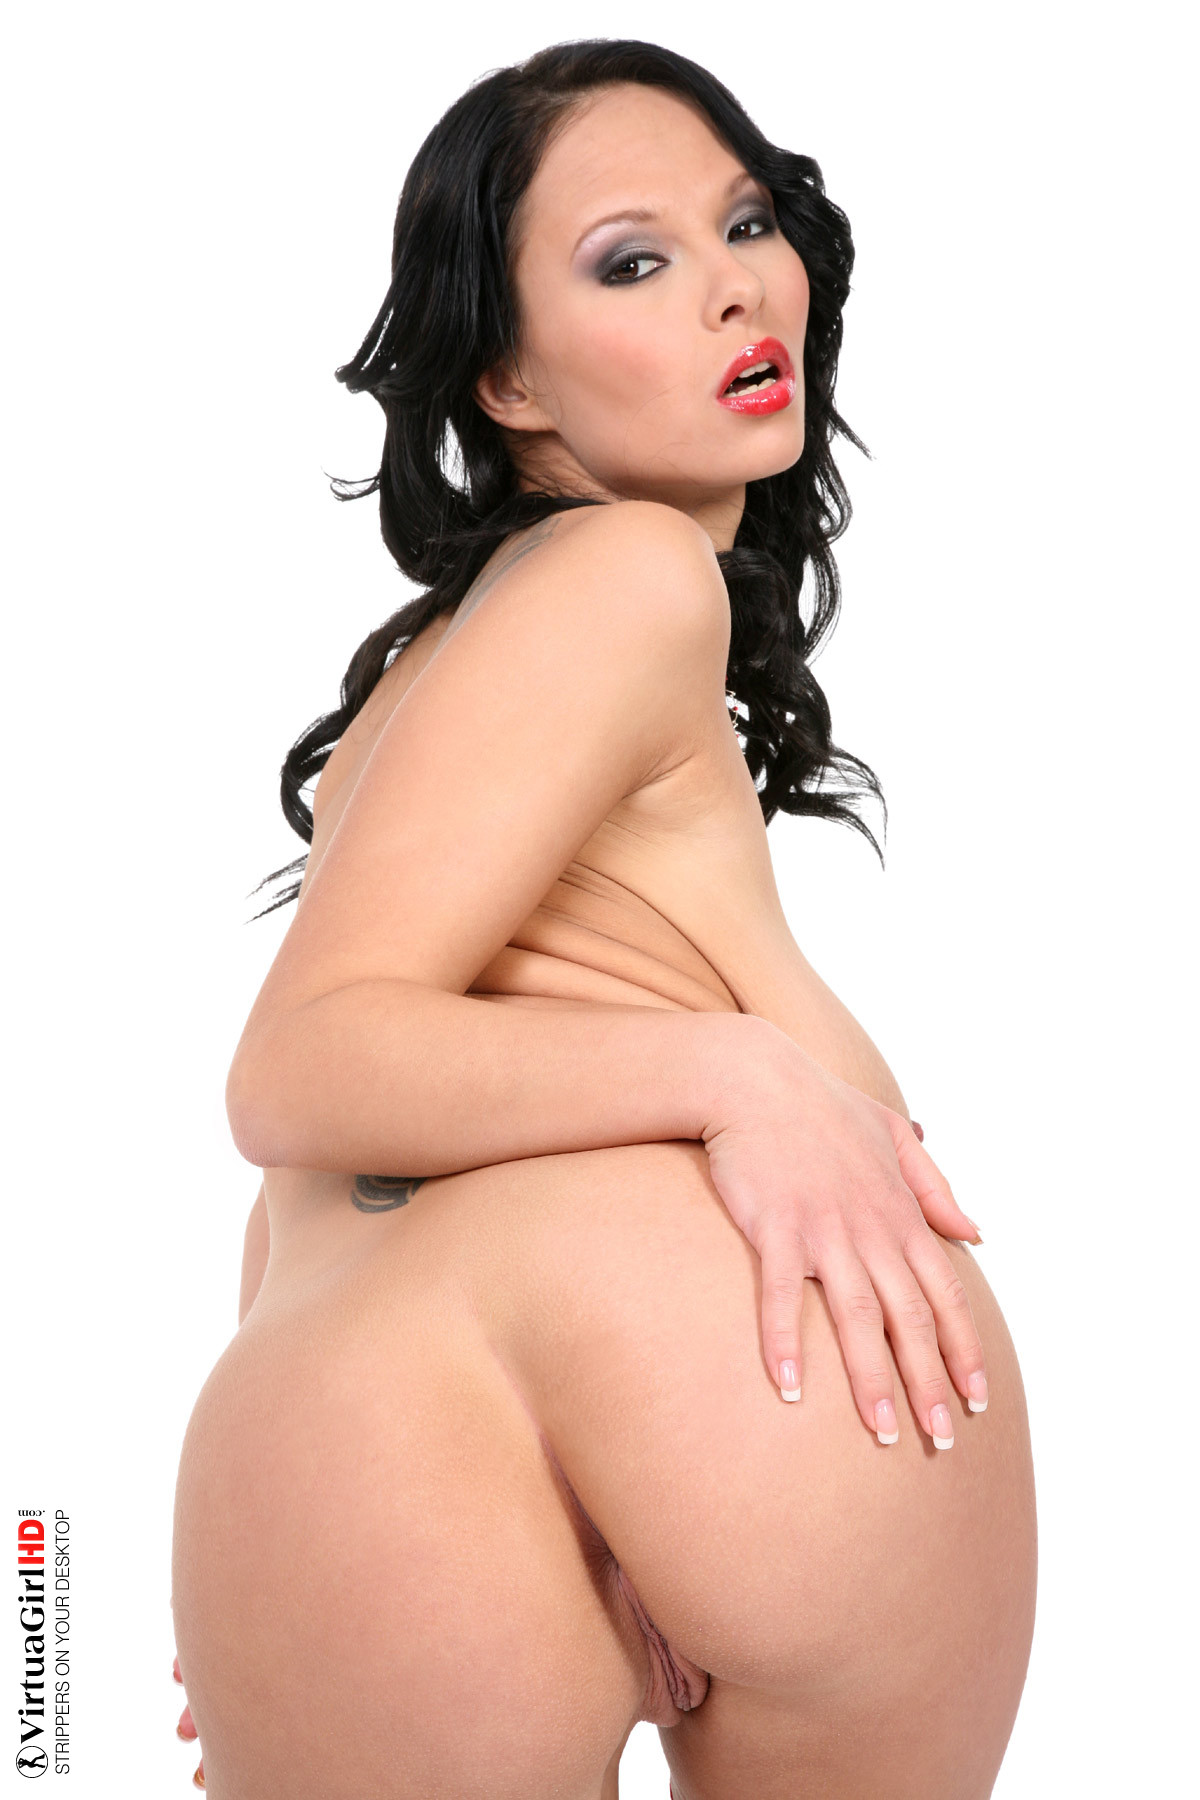 nude stripping girls